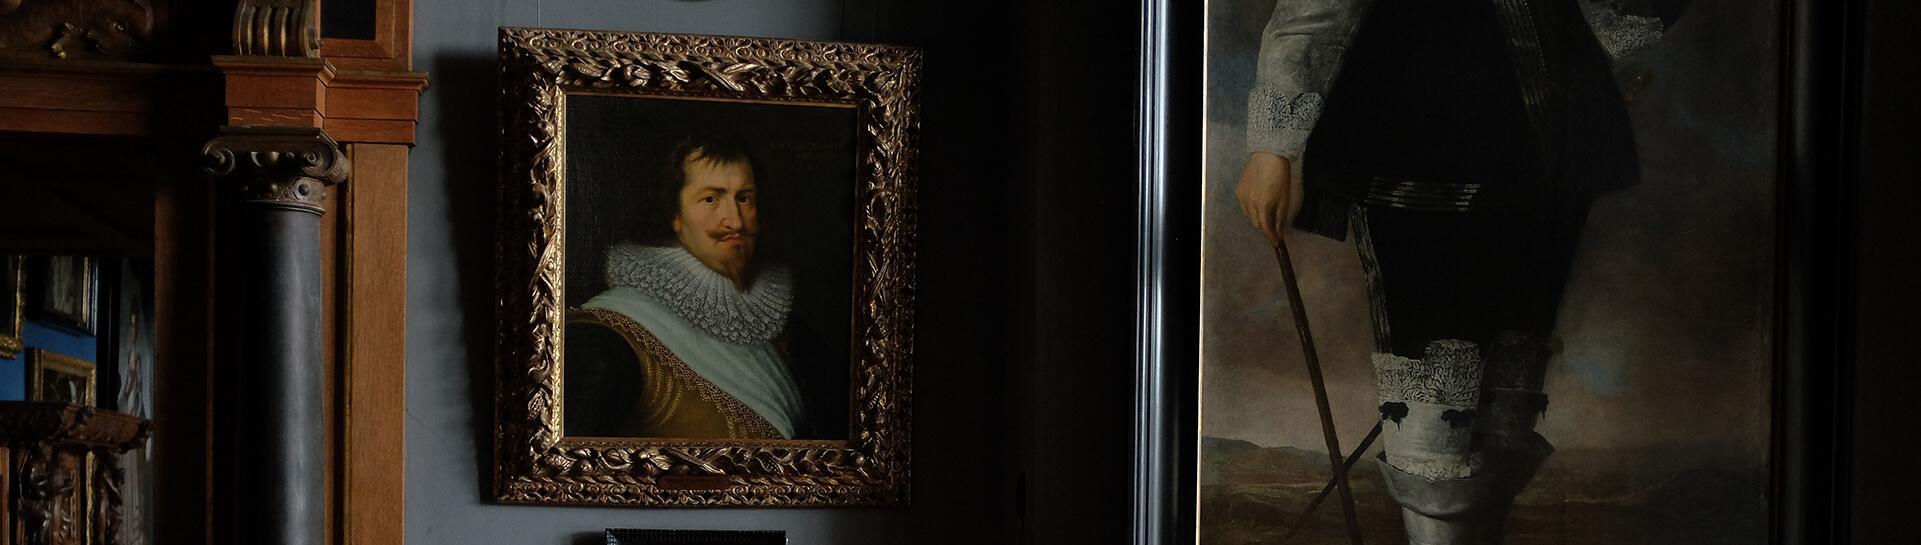 Artwork in a museum